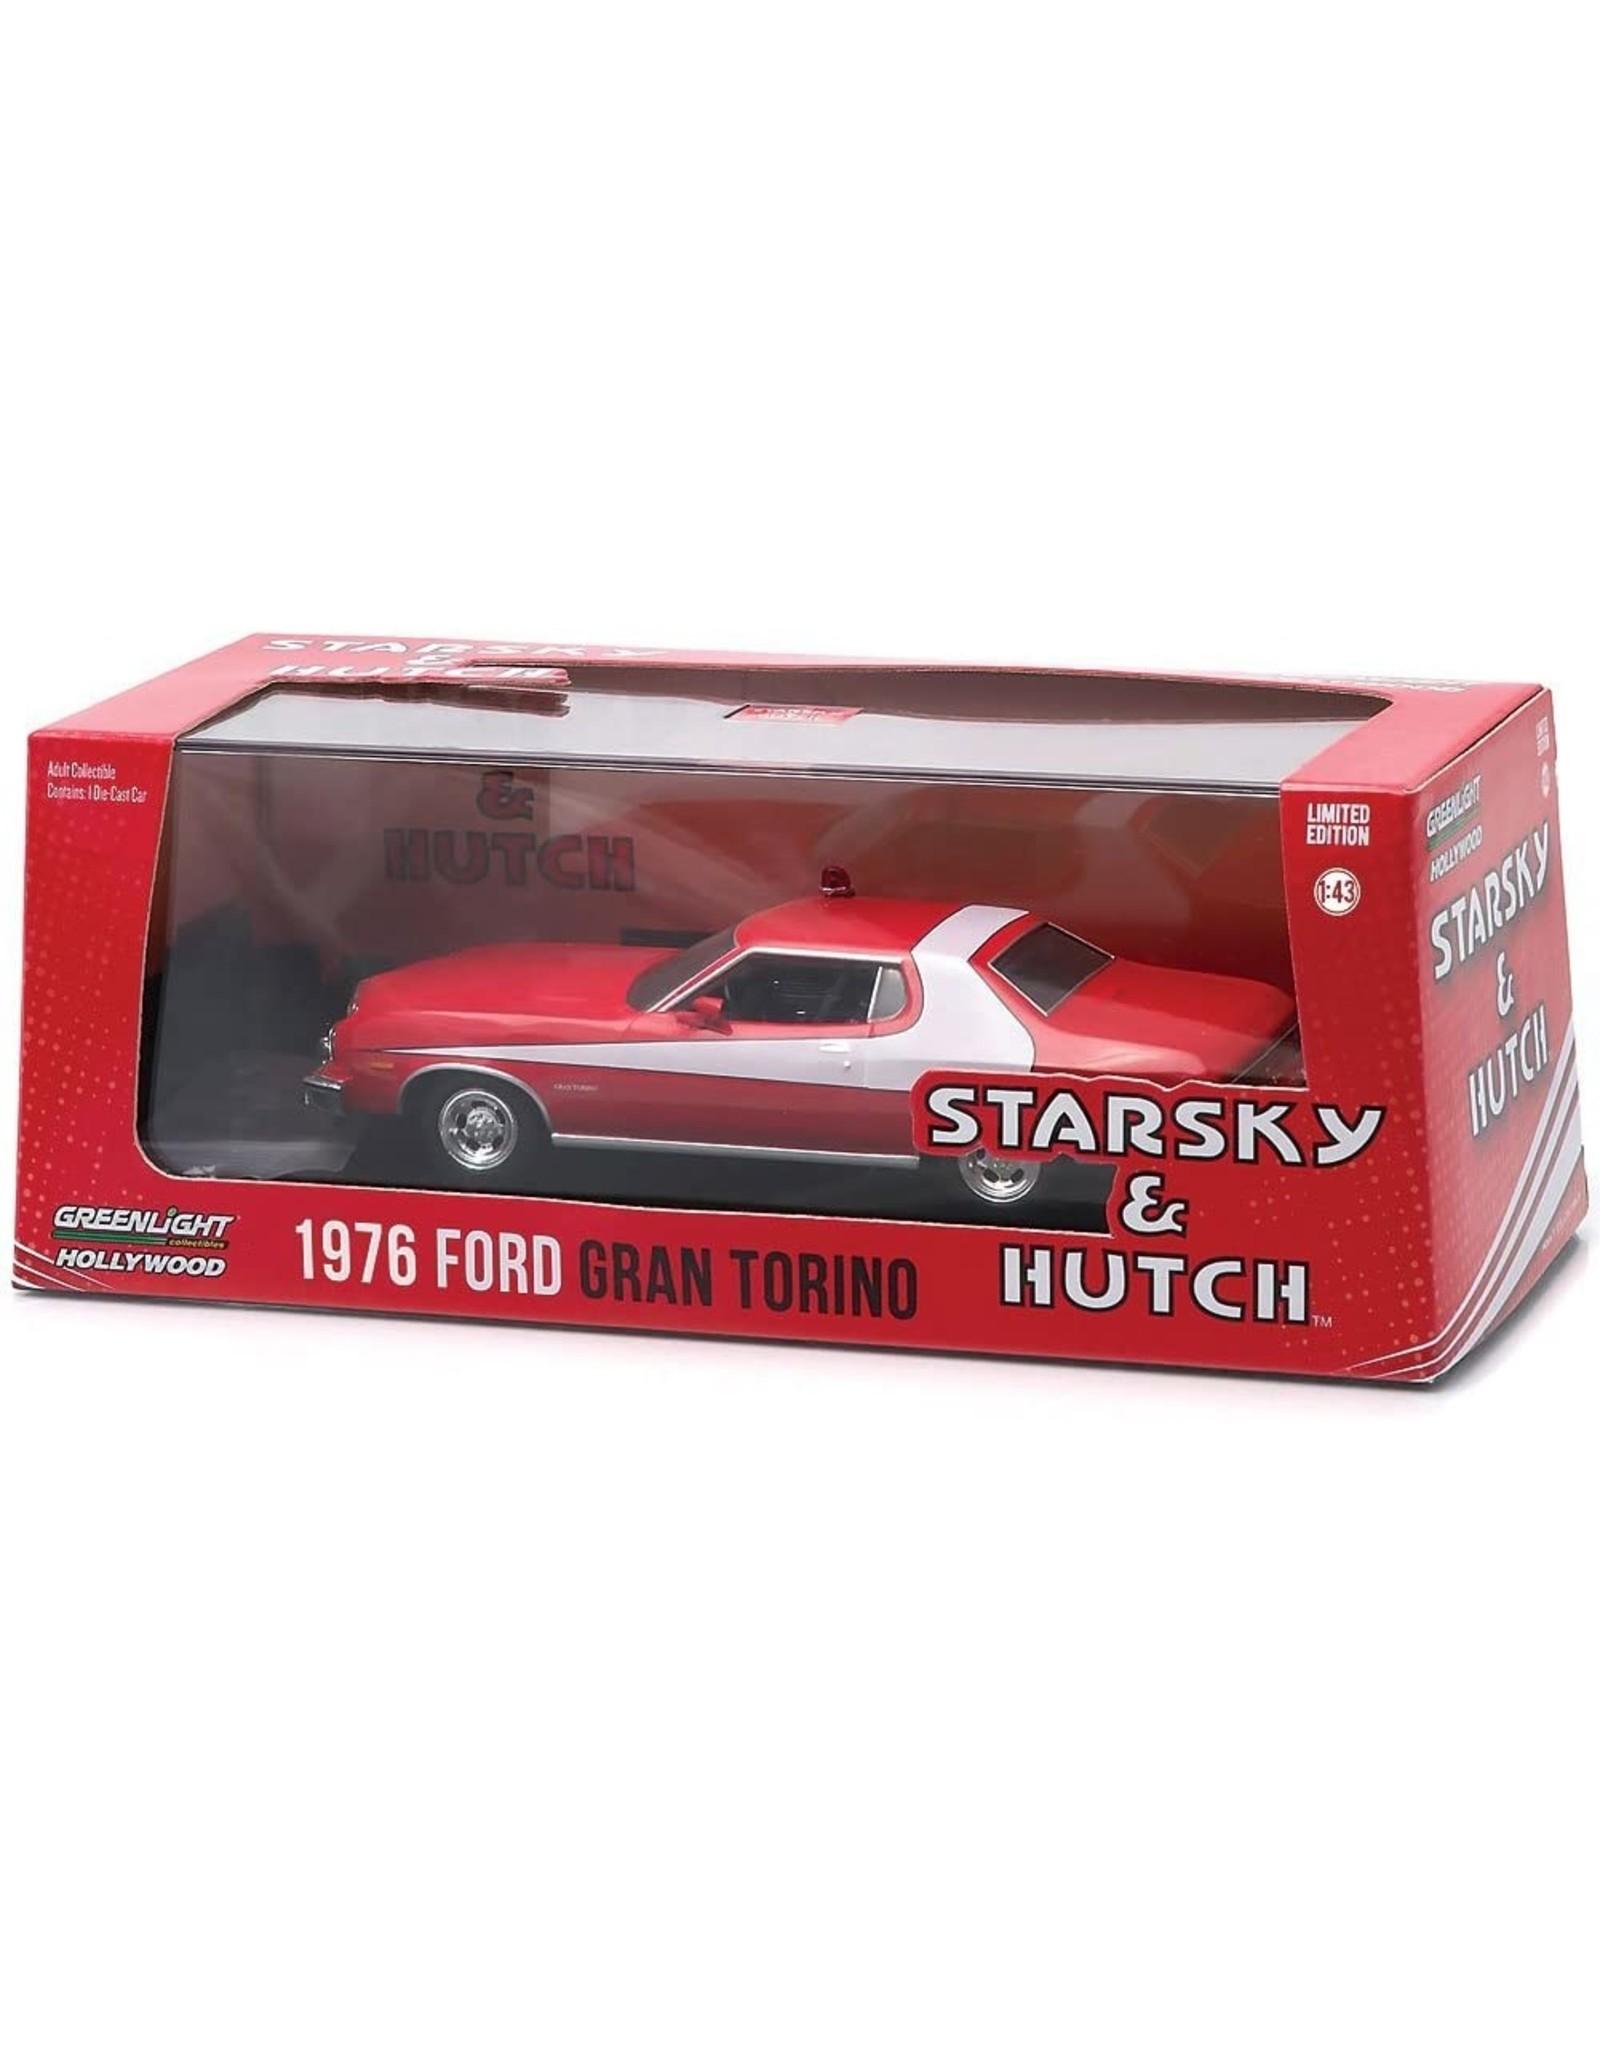 Movie Memorabilia Ford Gran Torino 'Starsky & Hutch' 1976 - 1:43 - Greenlight